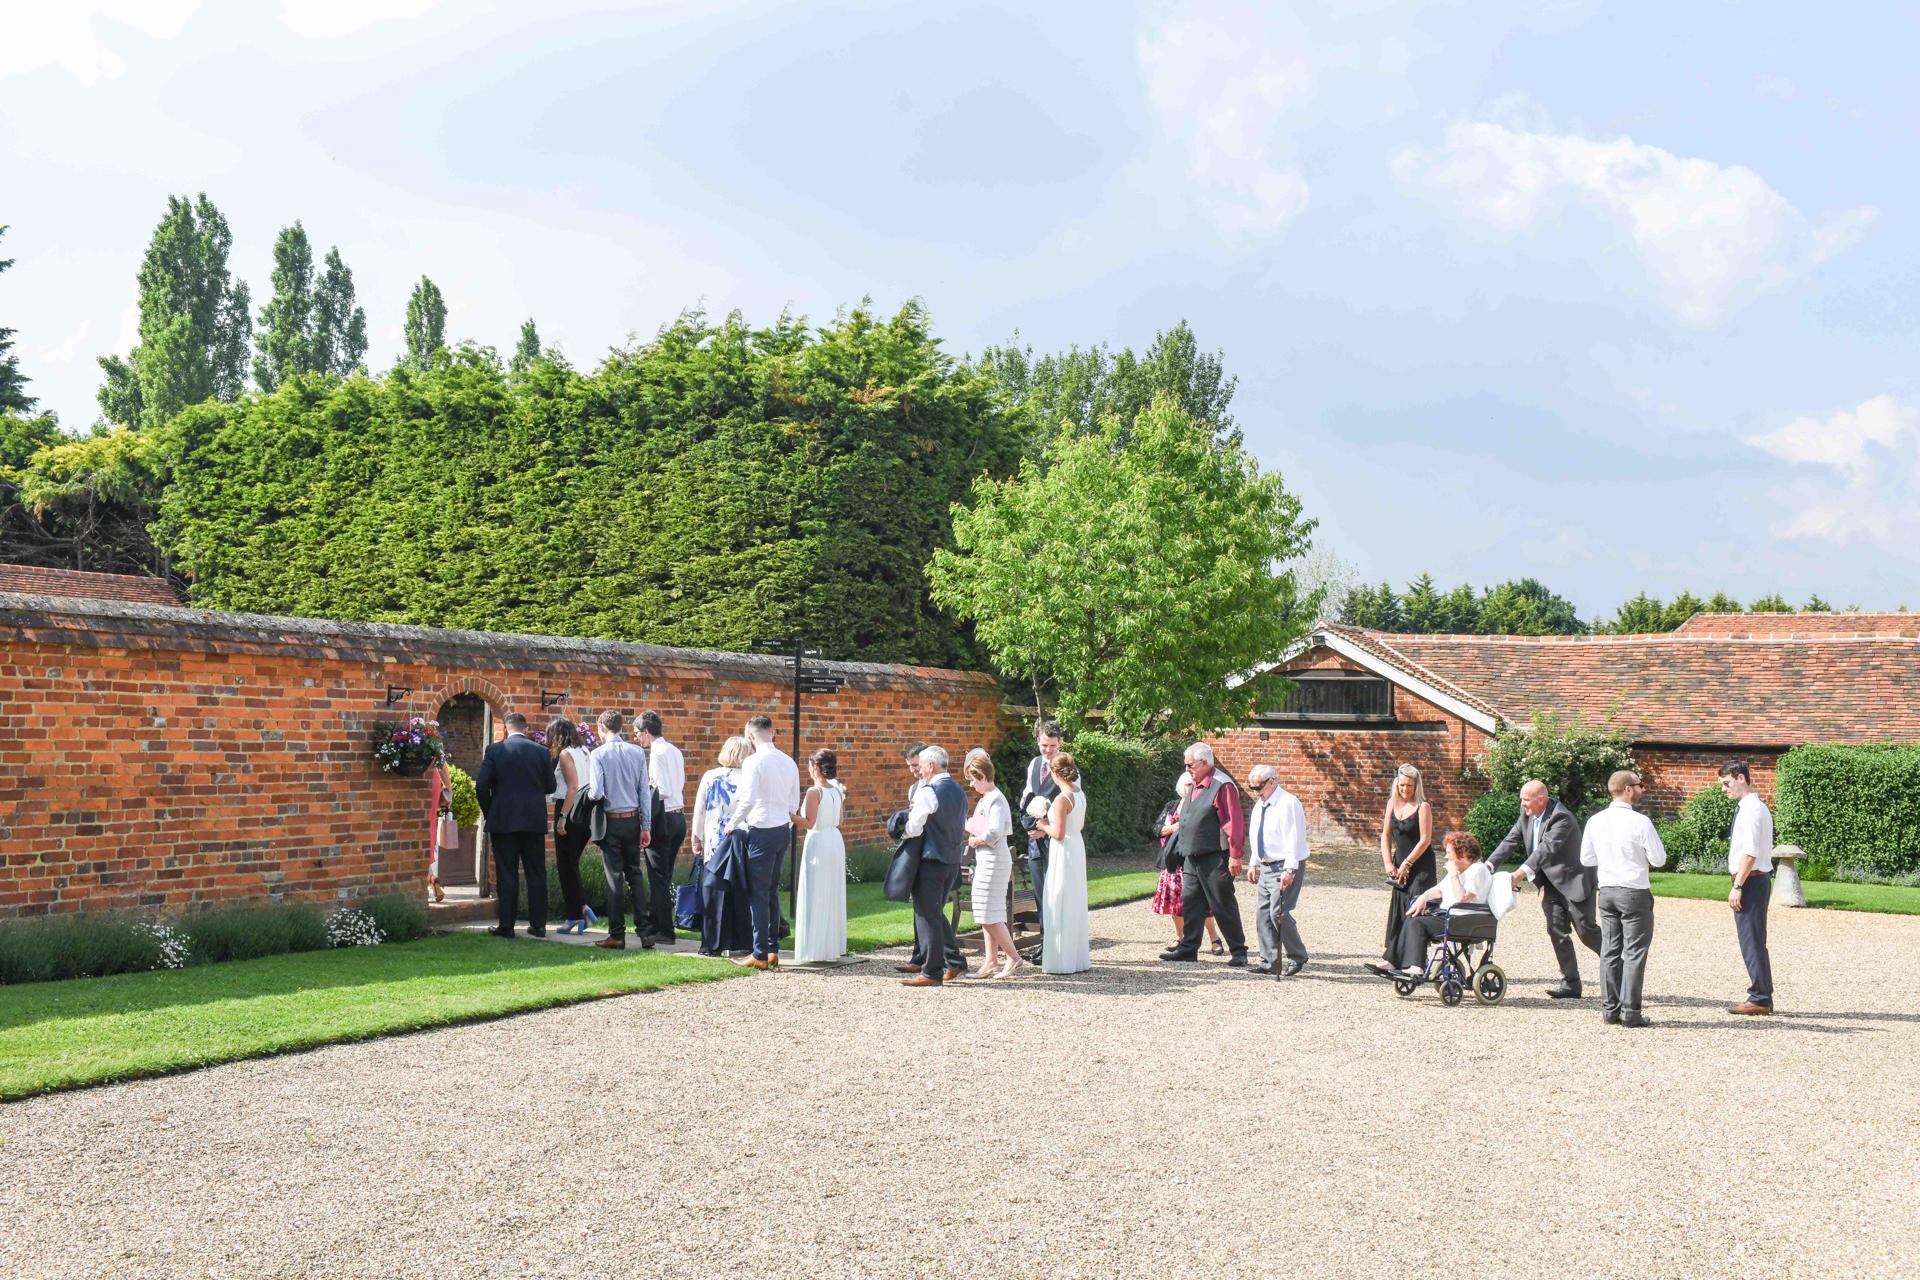 Lillibrook Manor Barn Wedding, Maidenhead, Alexandria Hall Photography (61 of 82).jpg